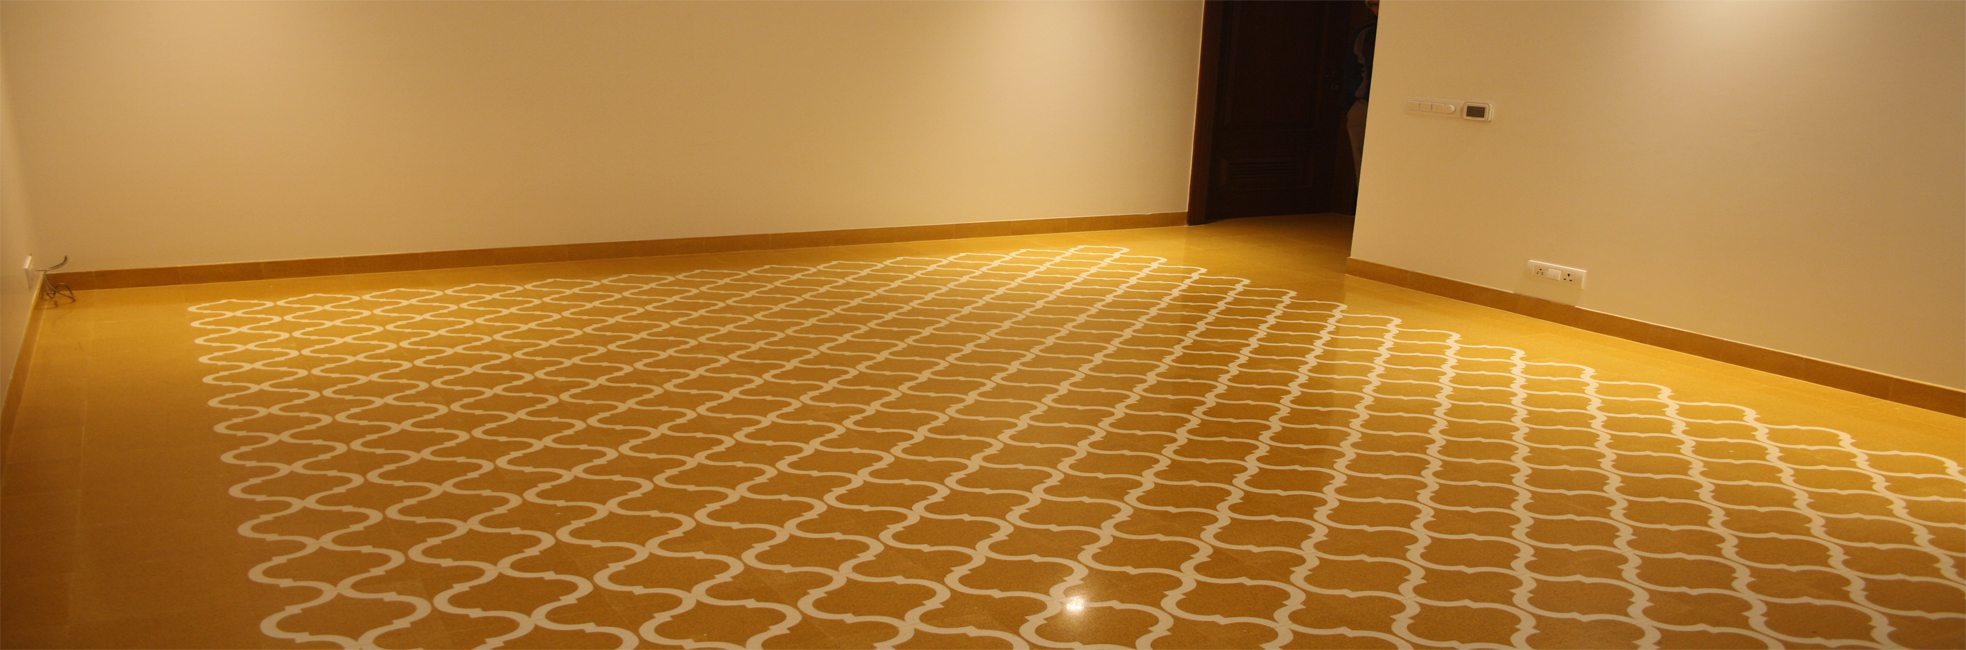 Cement Tiles Designer Cement Tiles Handmade Cement Tiles